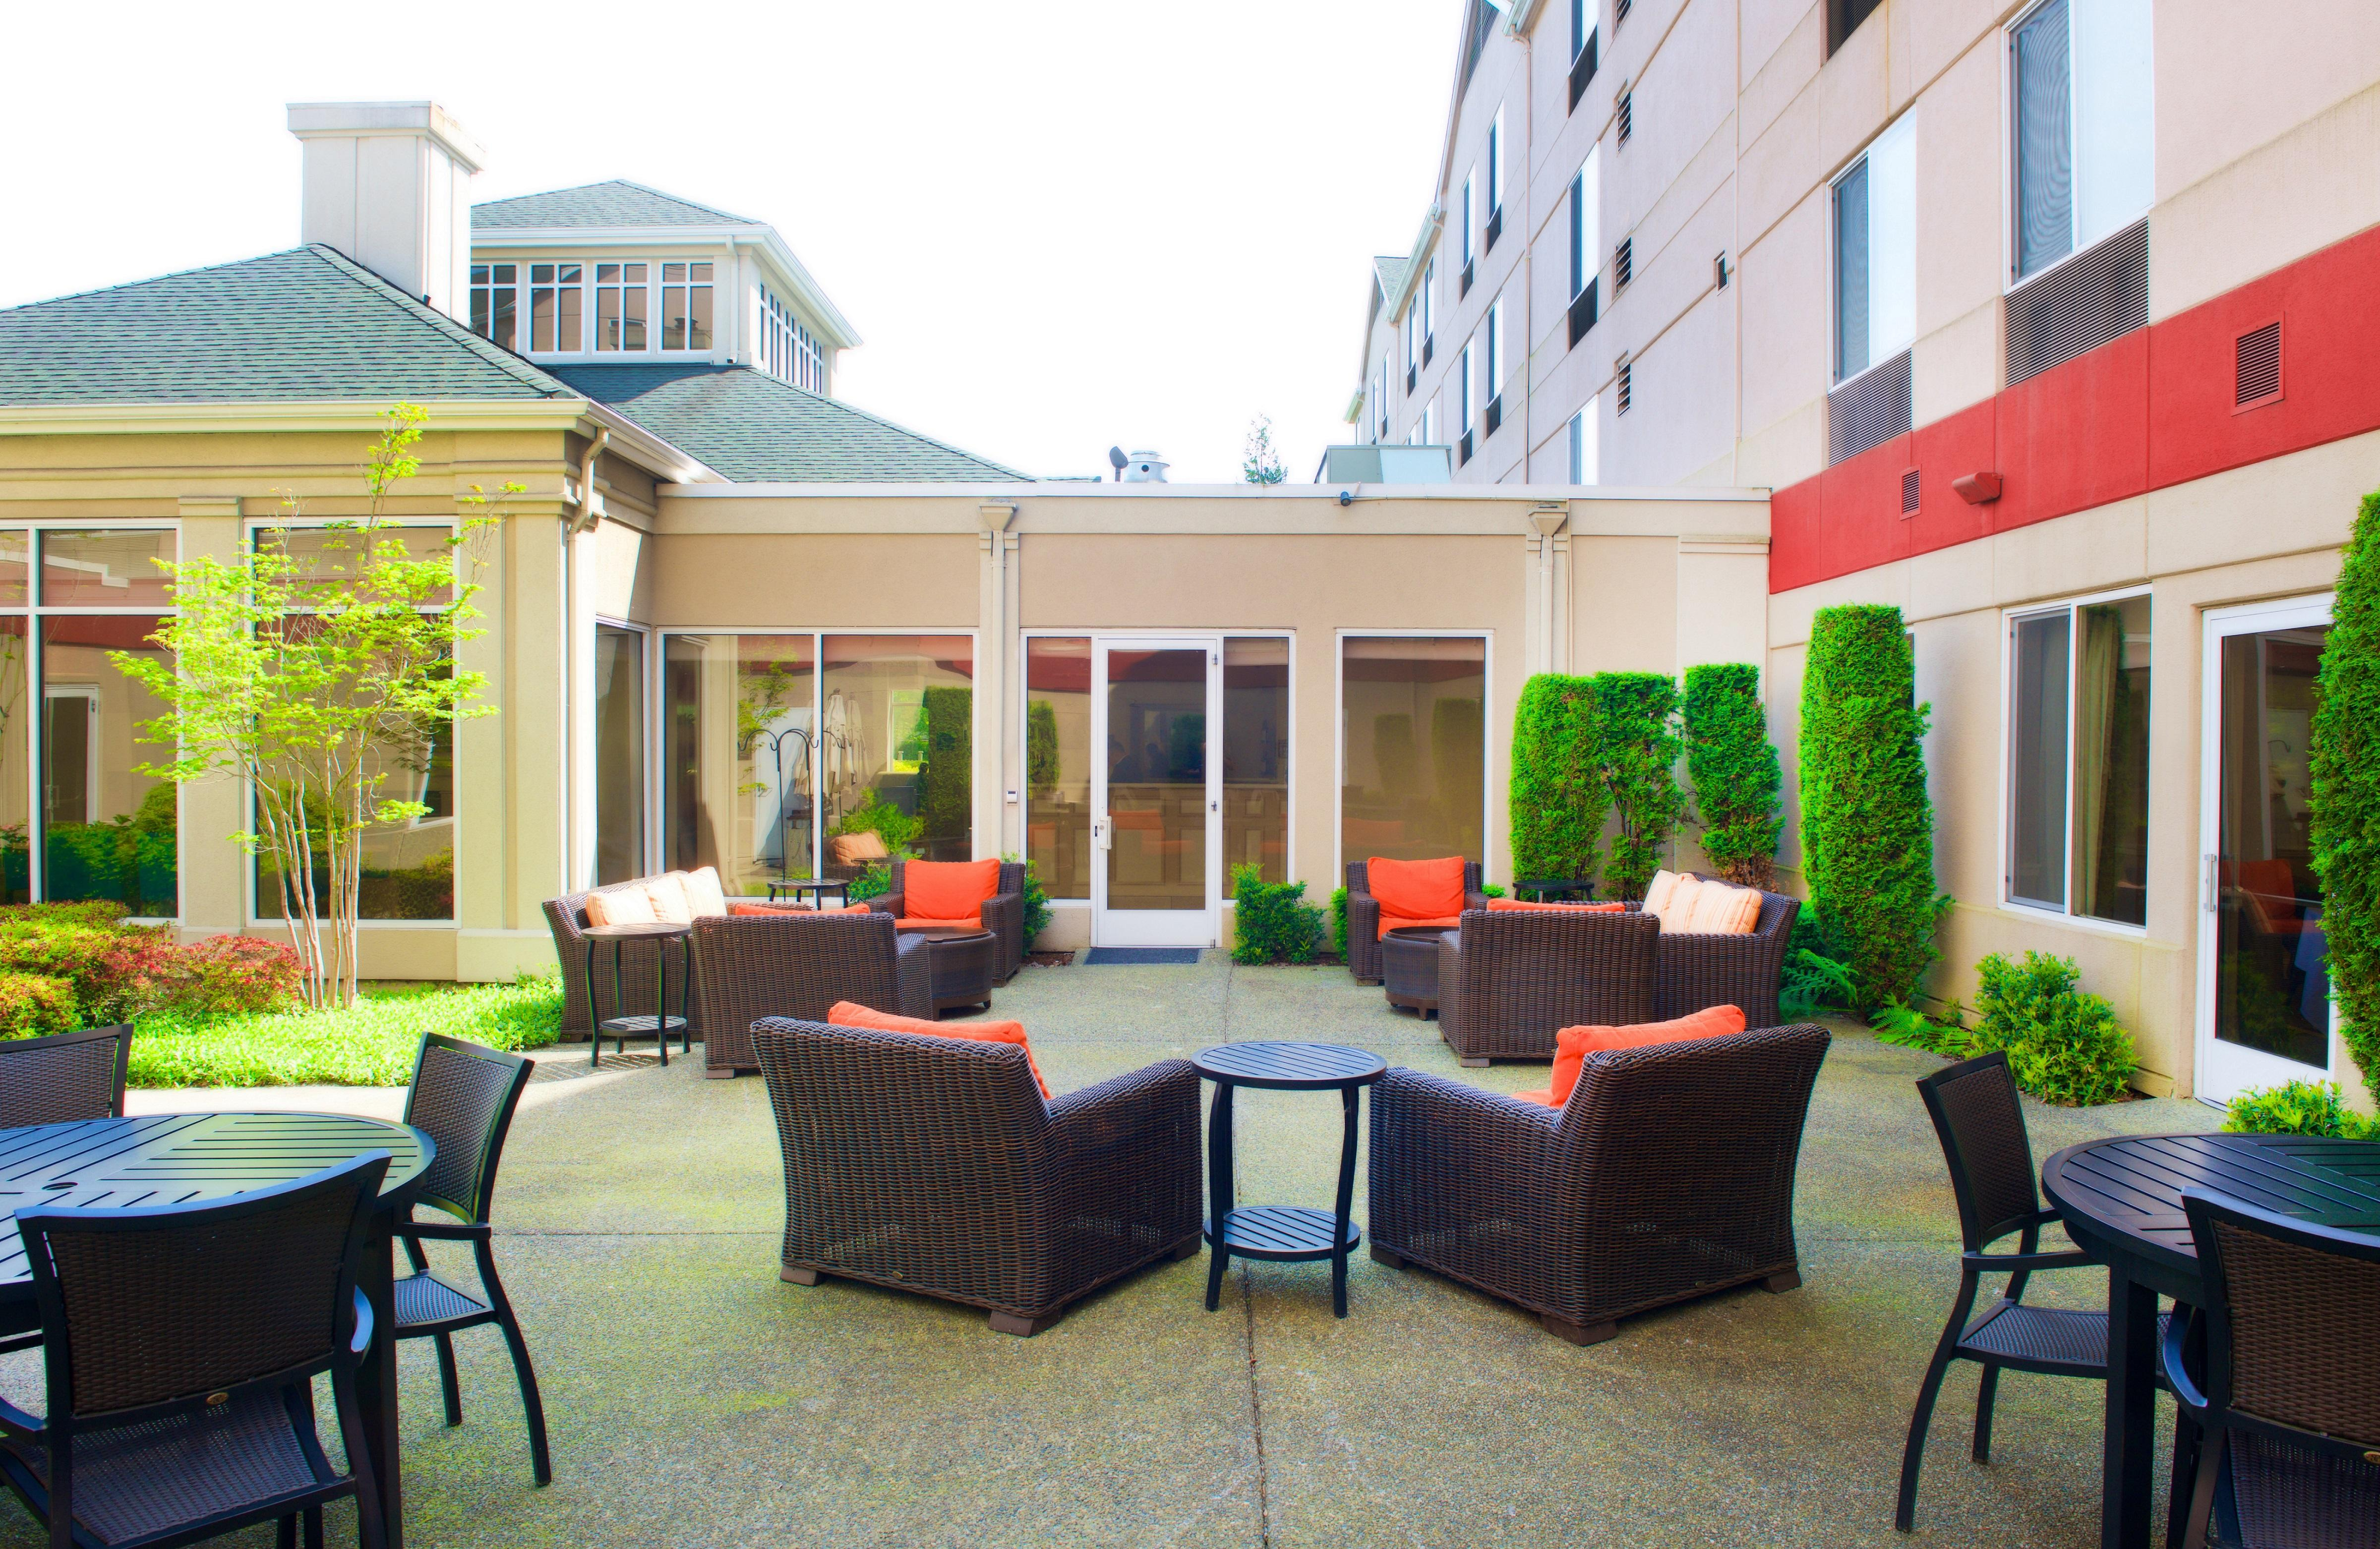 hilton garden inn seattle renton in renton wa 98057